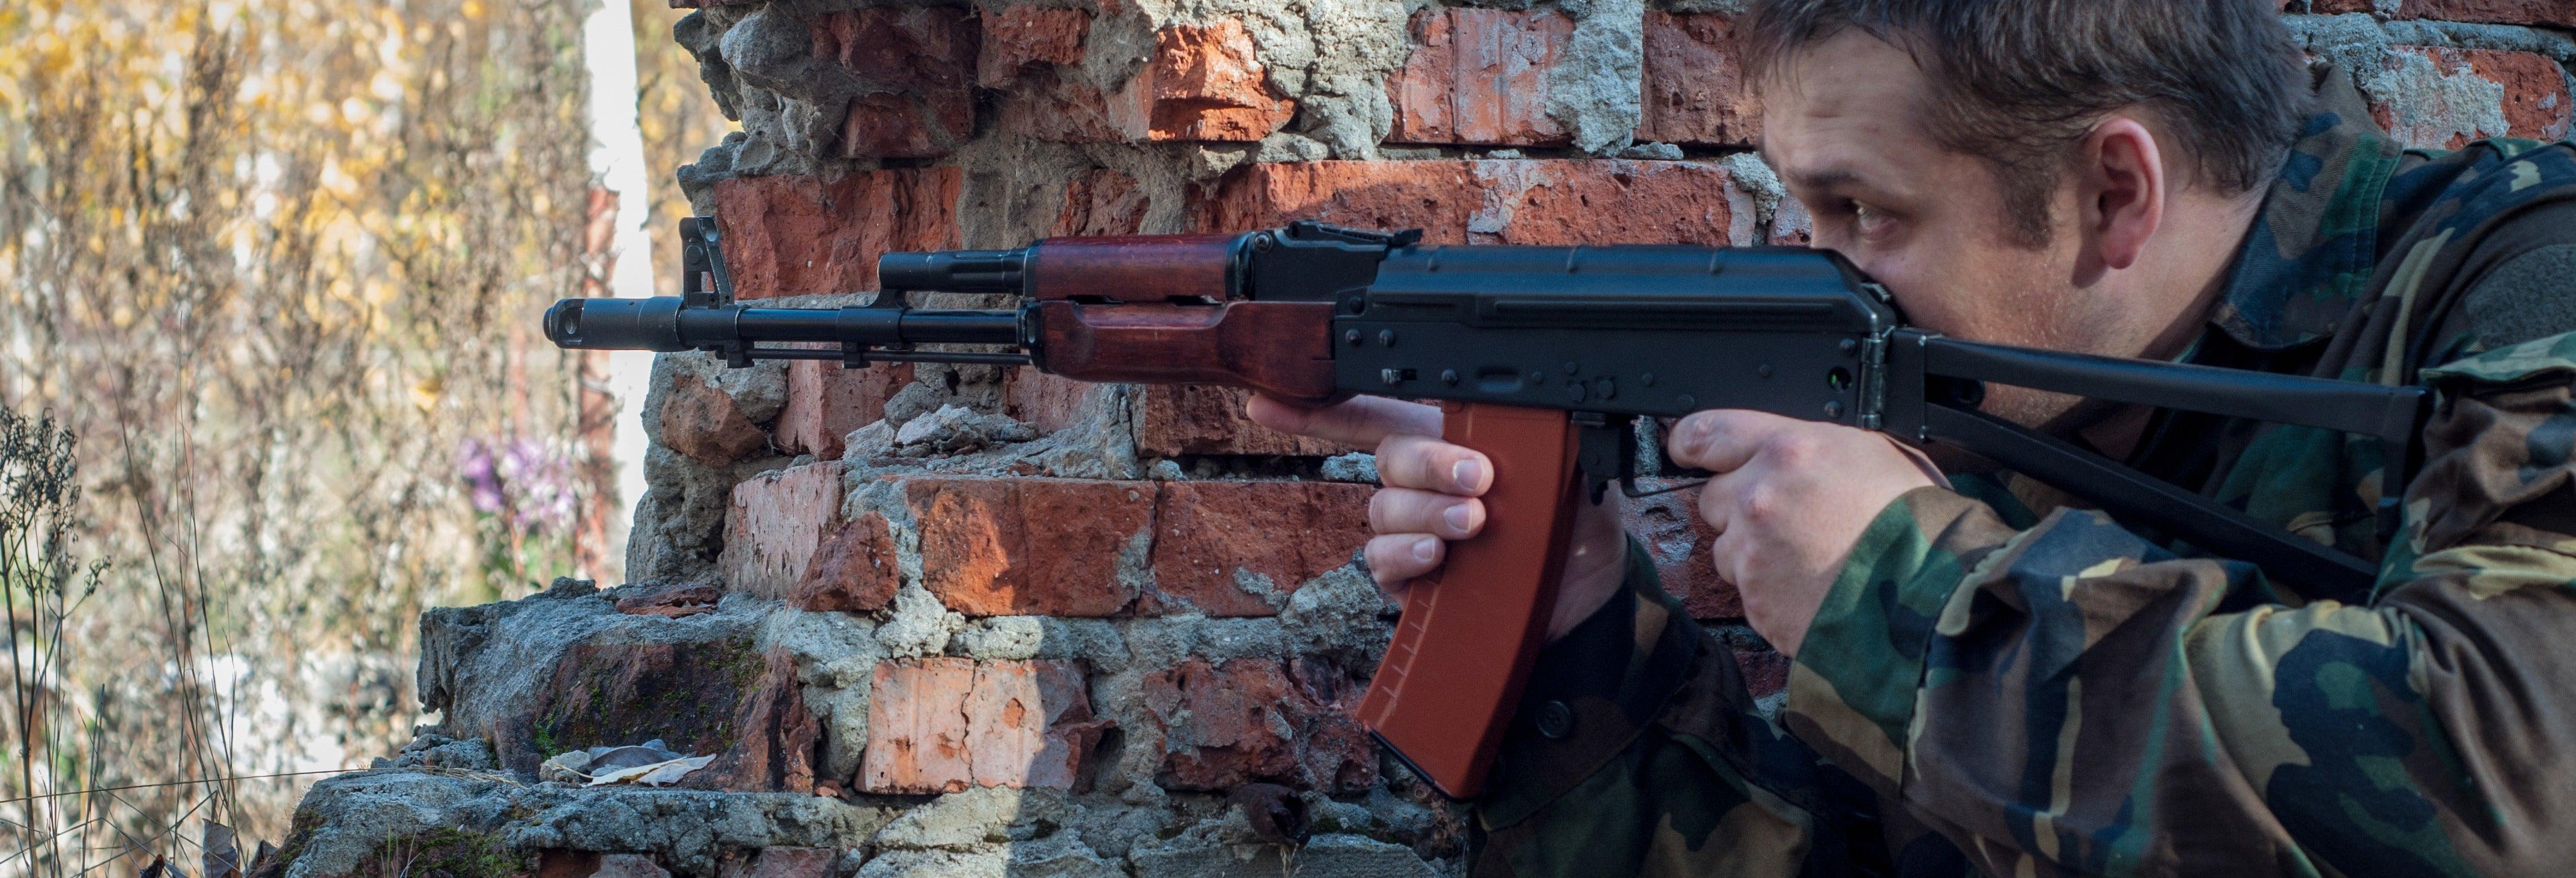 Séance de tir à la Kalachnikov